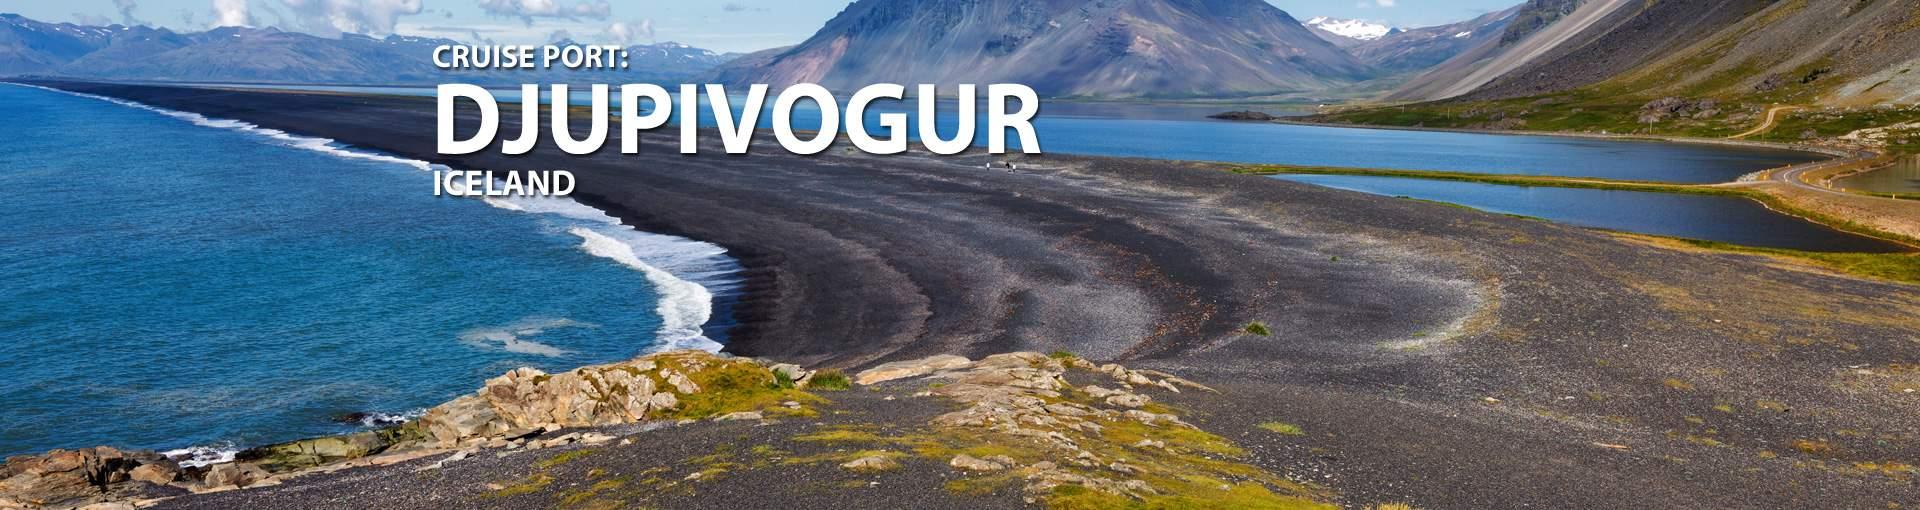 Cruises to Djupivogur, Iceland